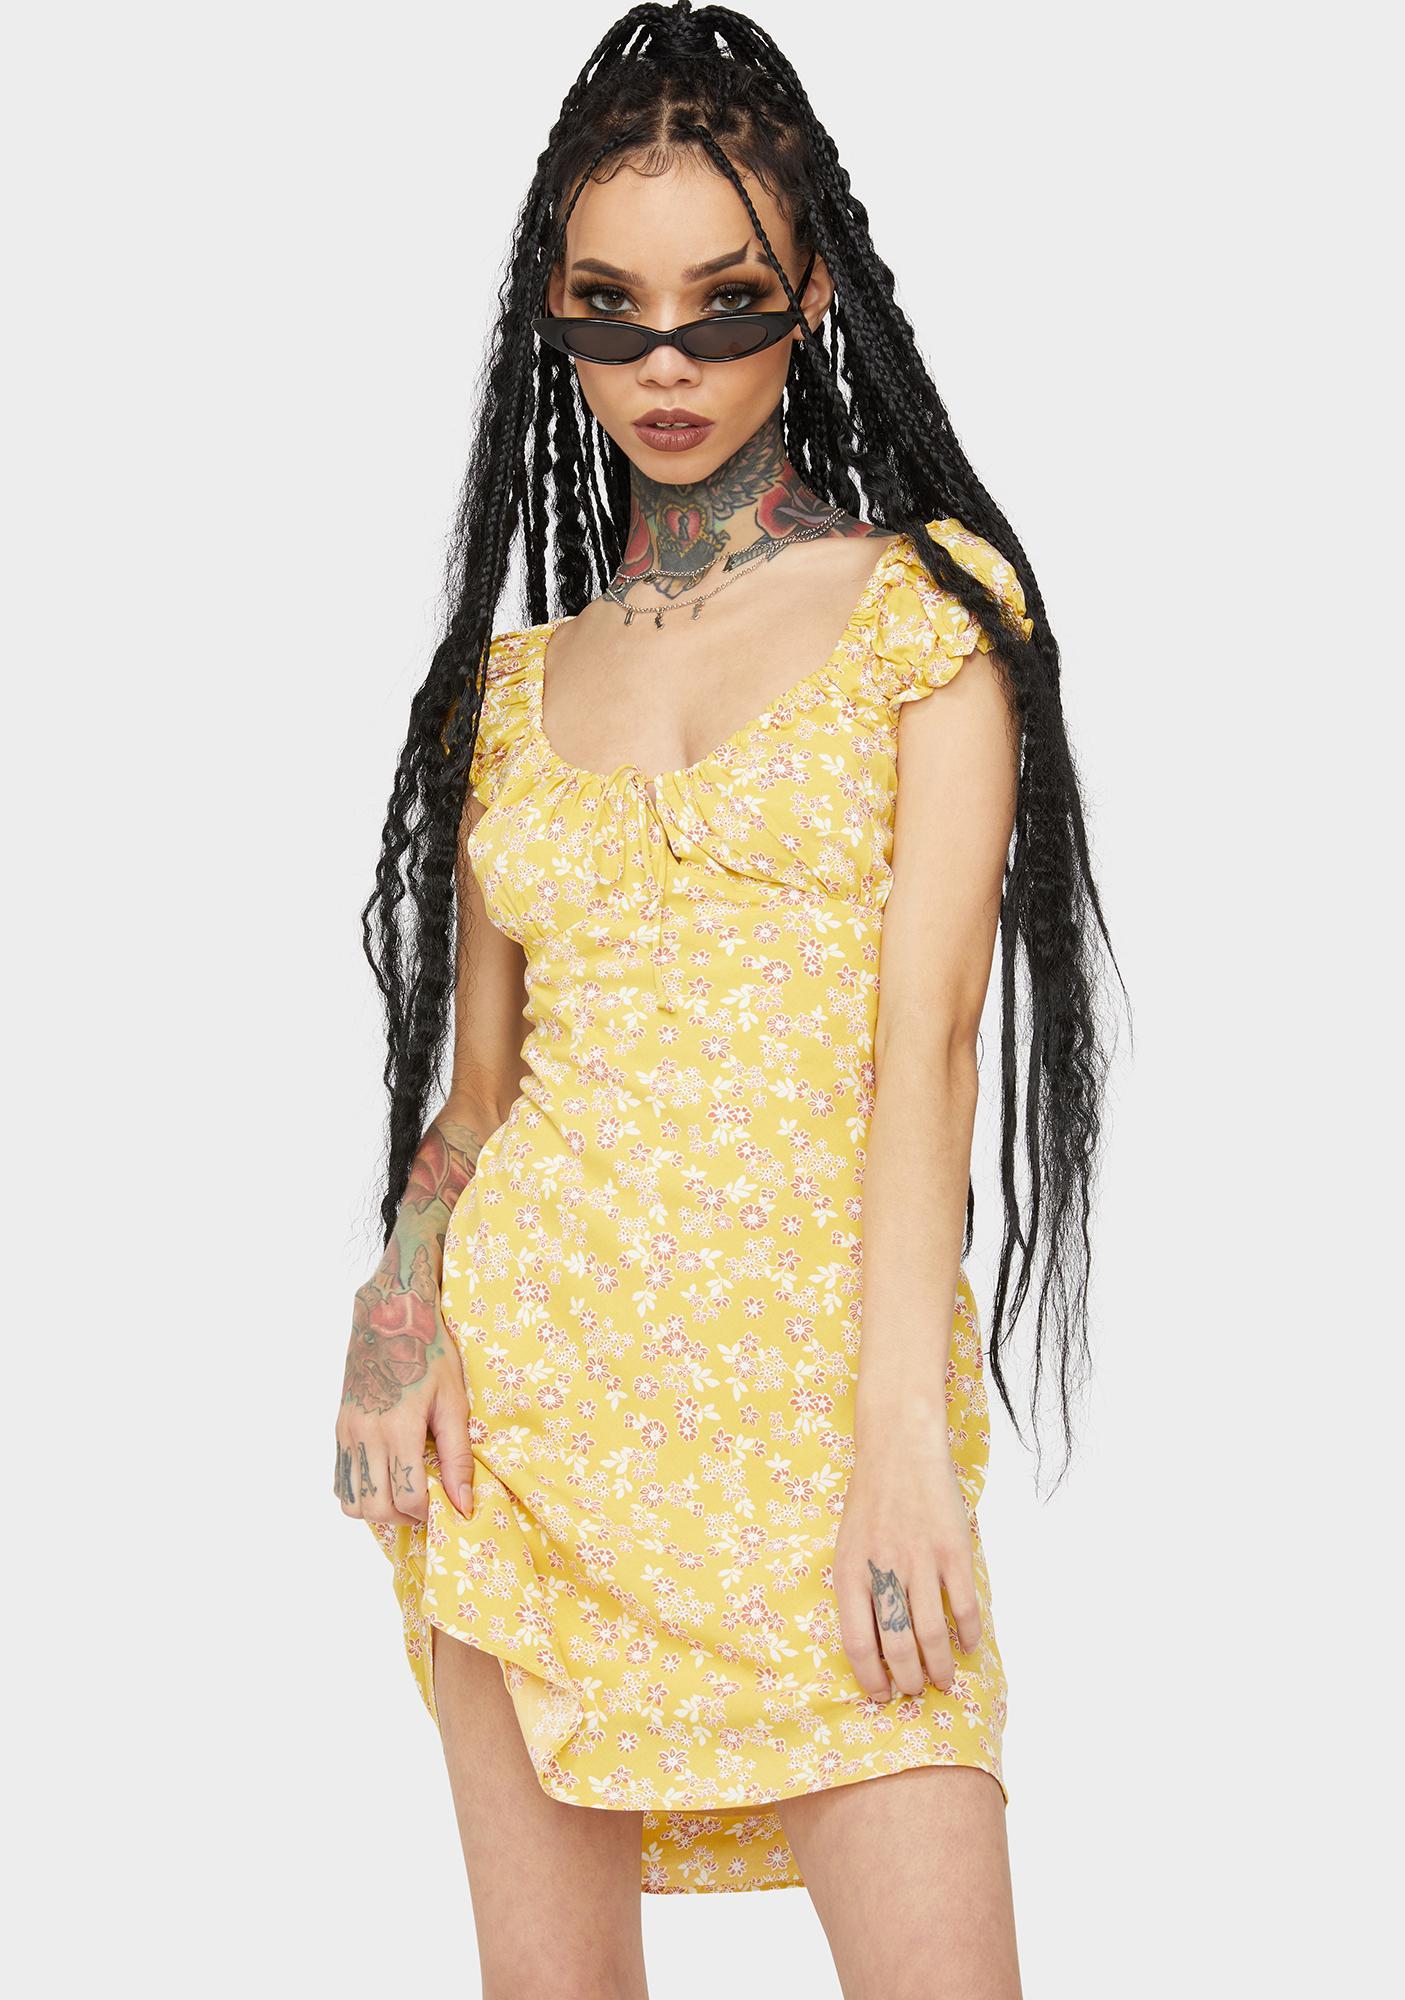 Honey It's A Date Mini Dress